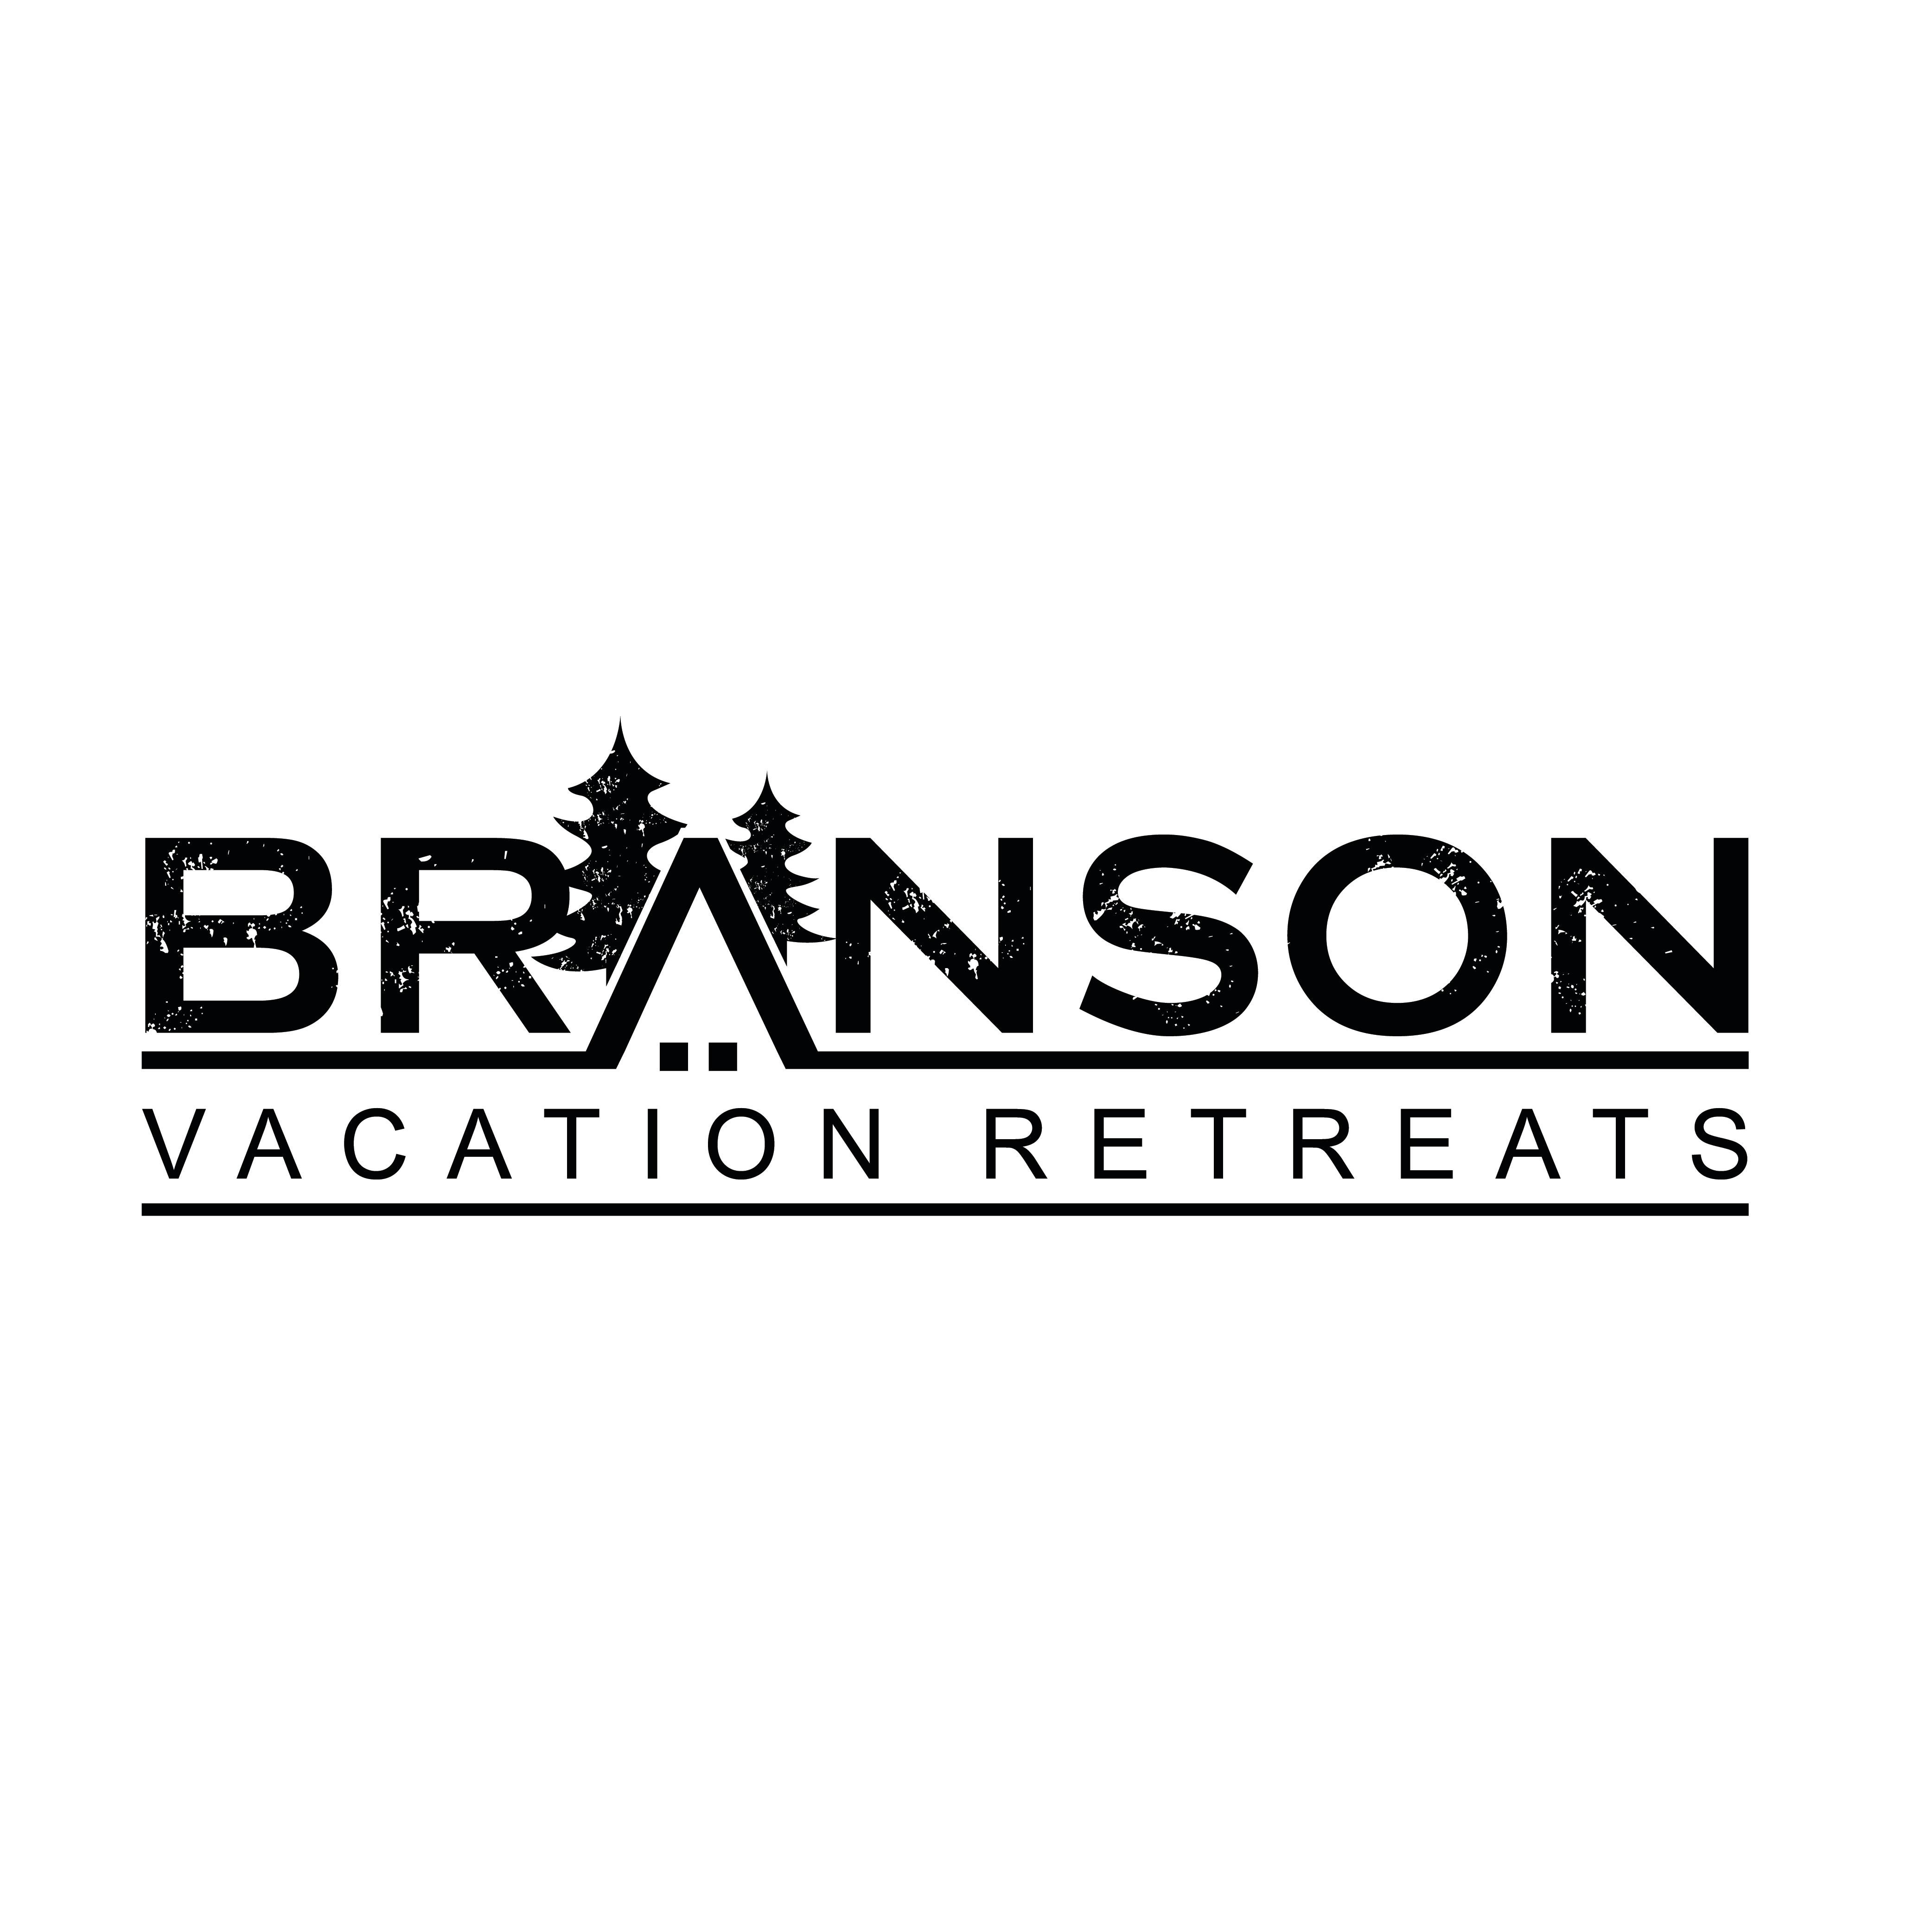 Branson Vacation Retreats